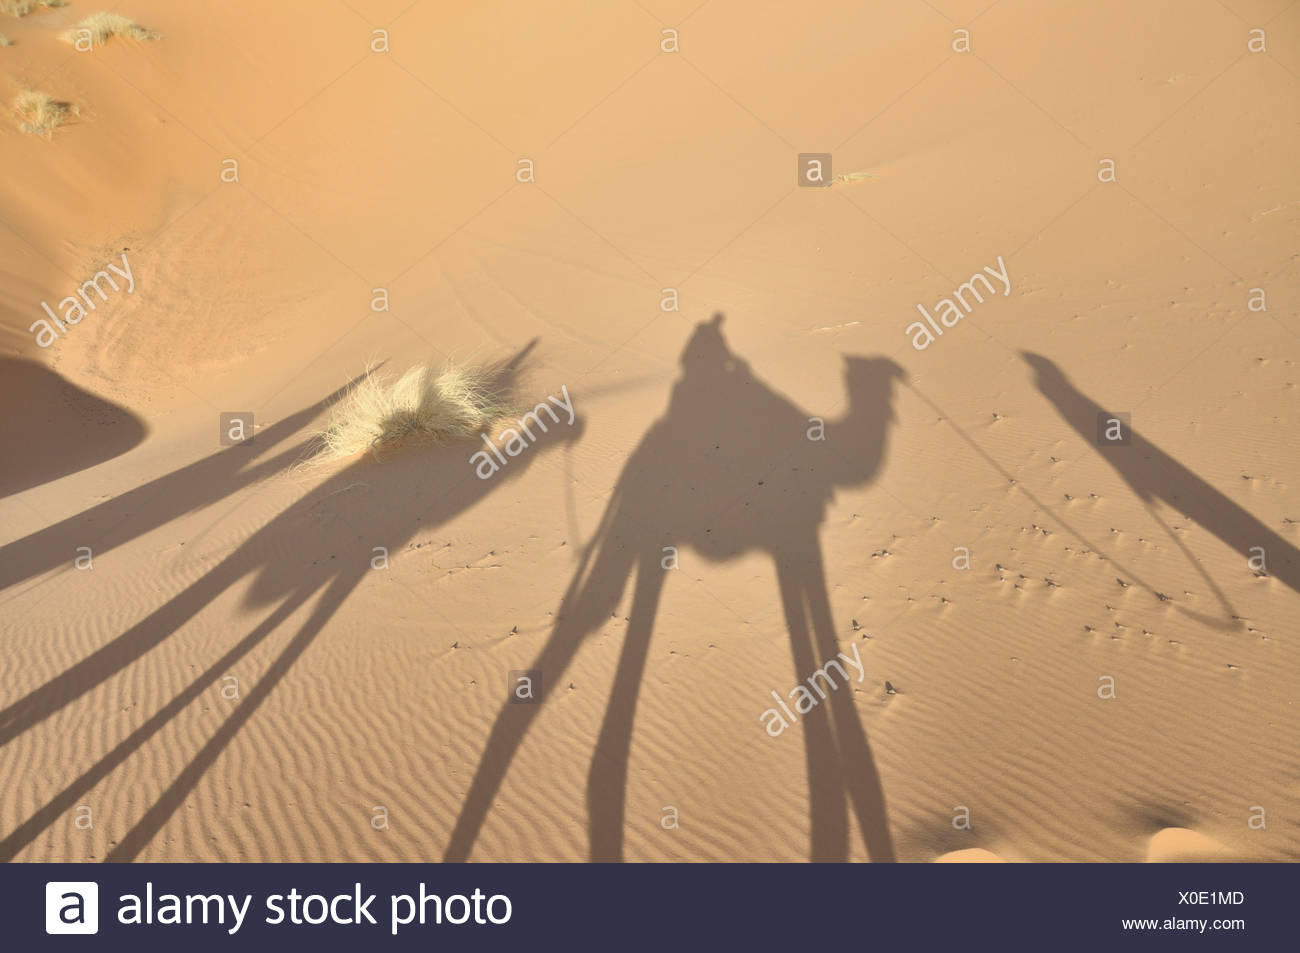 Dromedaries (Camelus dromedarius), desert trekking, Erg Chebbi, Morocco, Africa Stock Photo